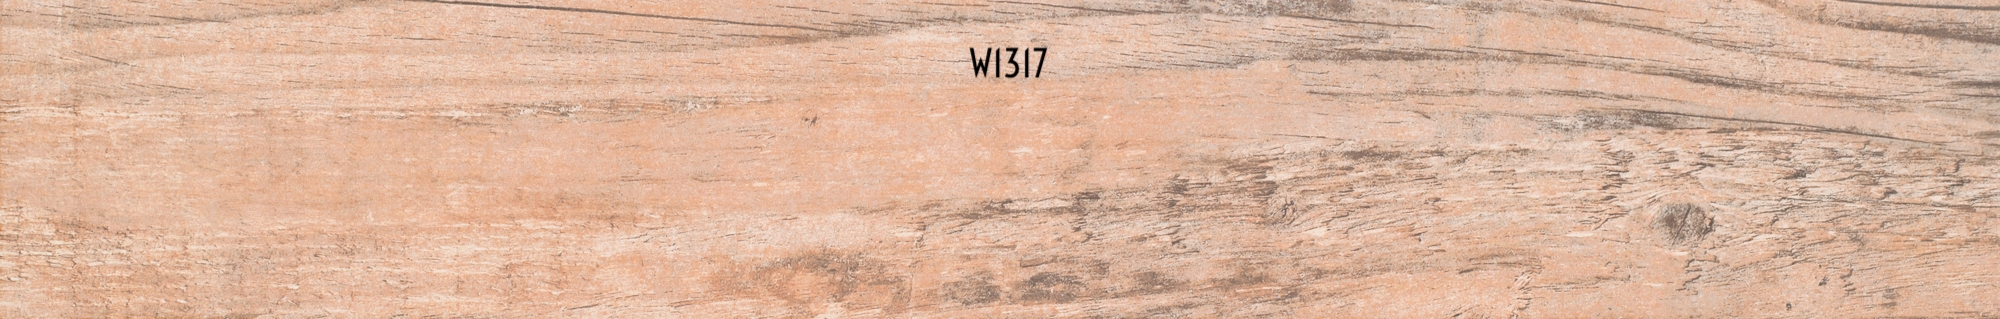 W1317